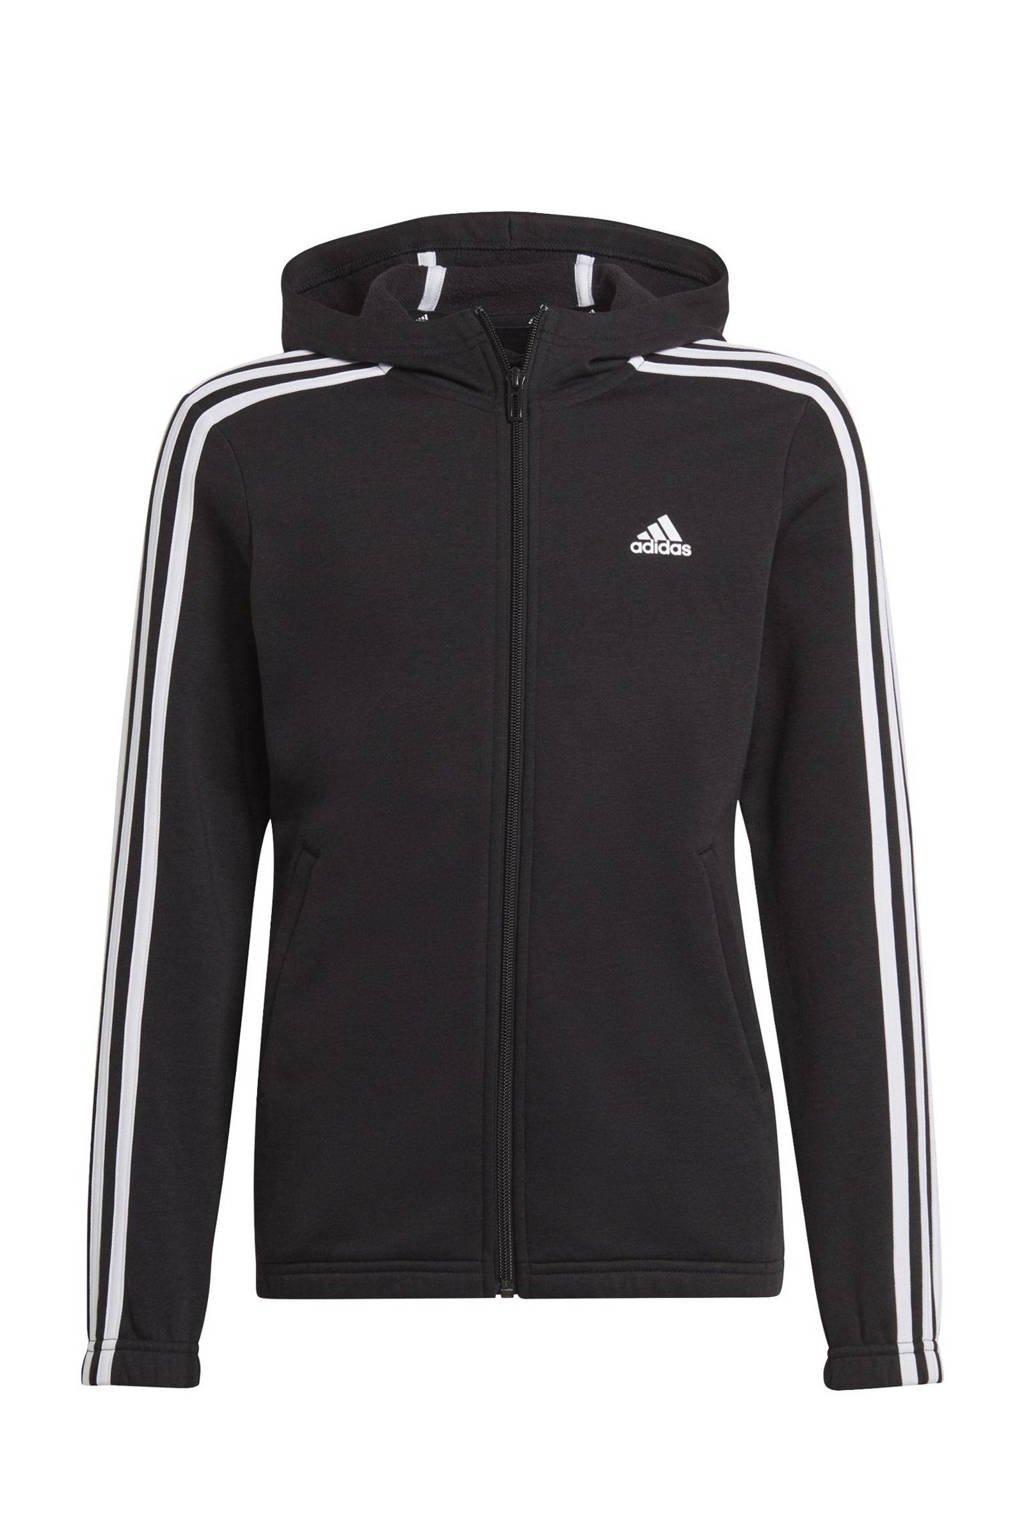 adidas Performance fleece sportvest zwart/wit, Zwart/wit